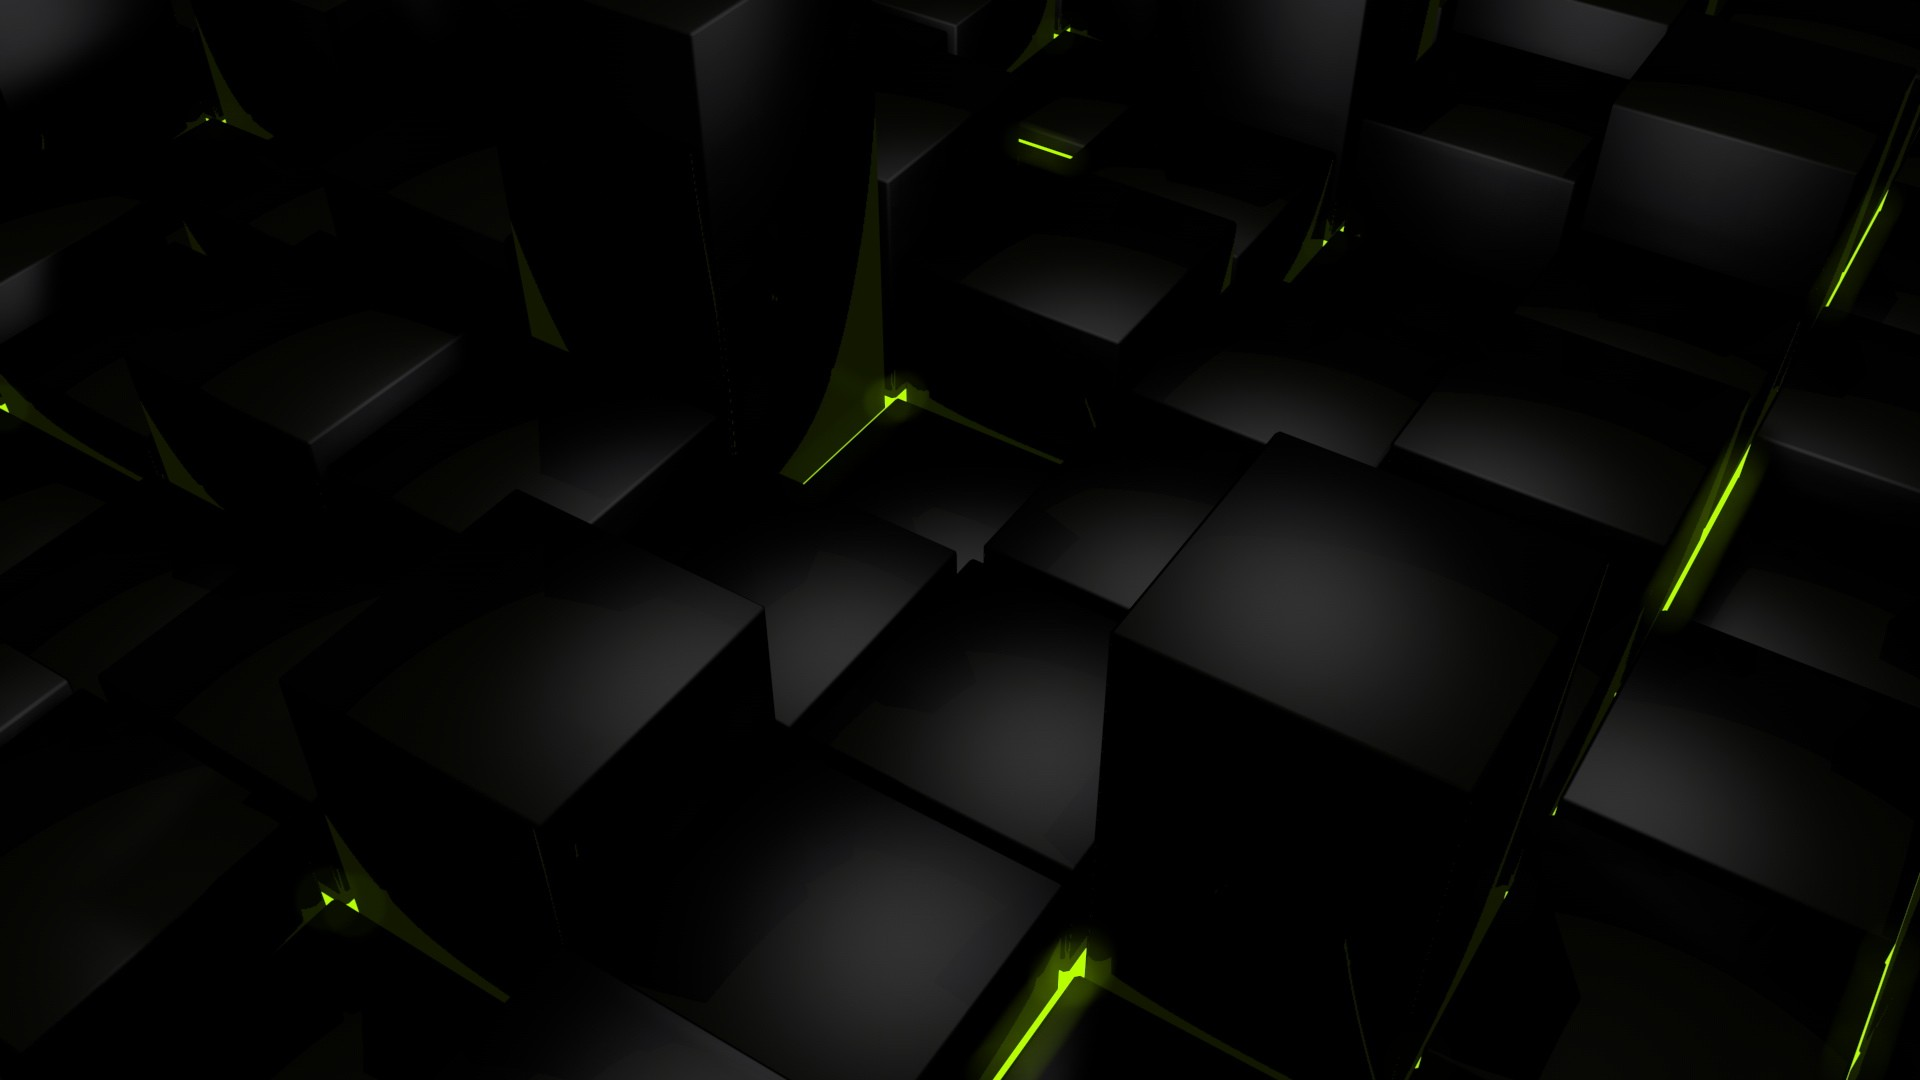 glow computer graphics wallpaper 1920x1080 67125 WallpaperUP 1920x1080